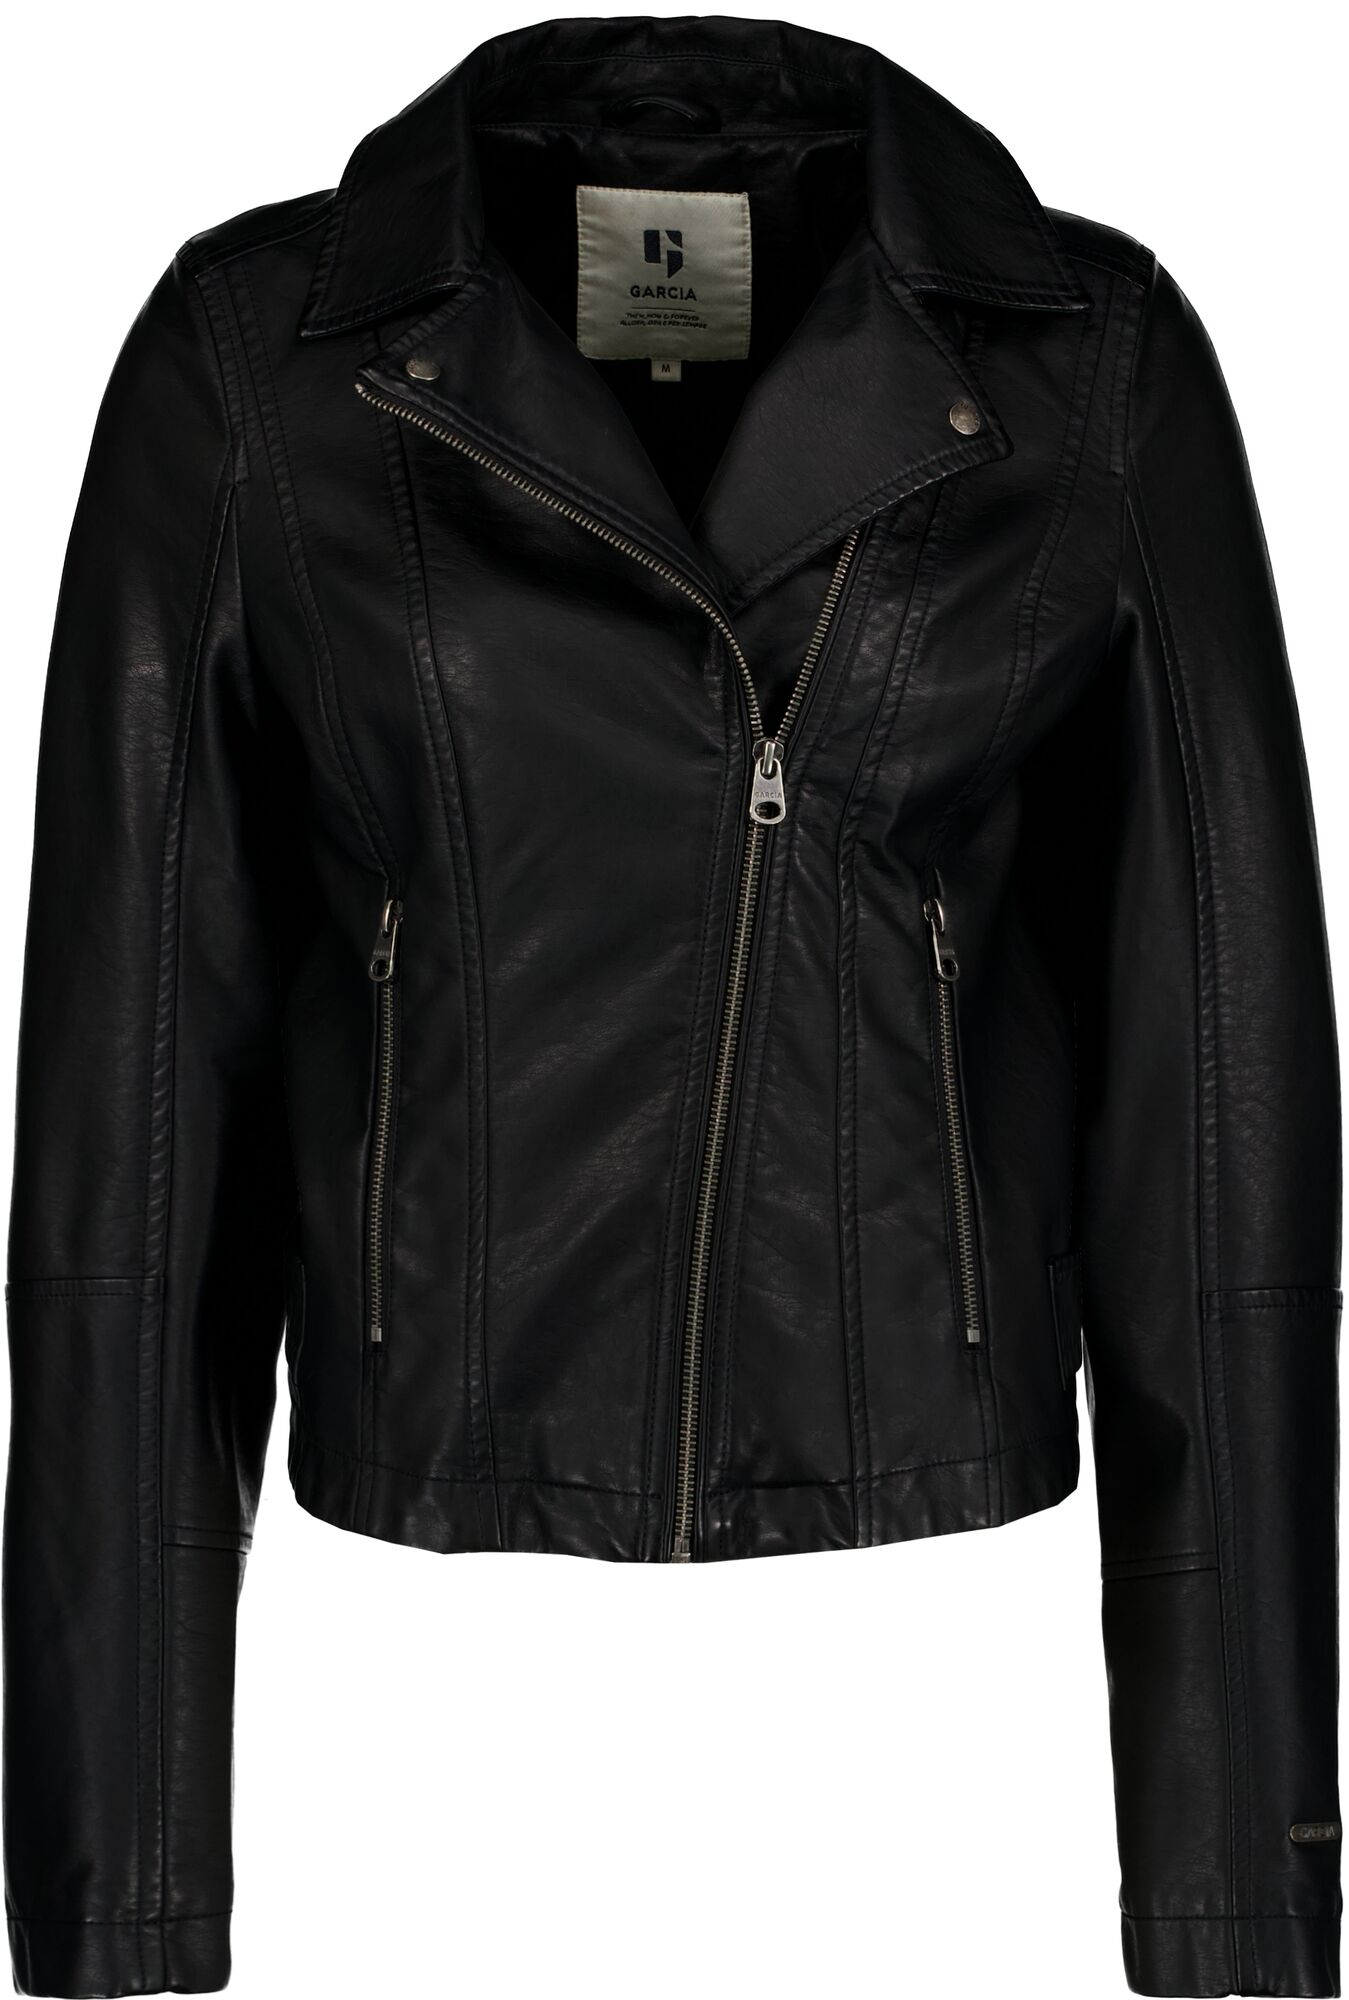 Garcia - Ladies-Outerwear